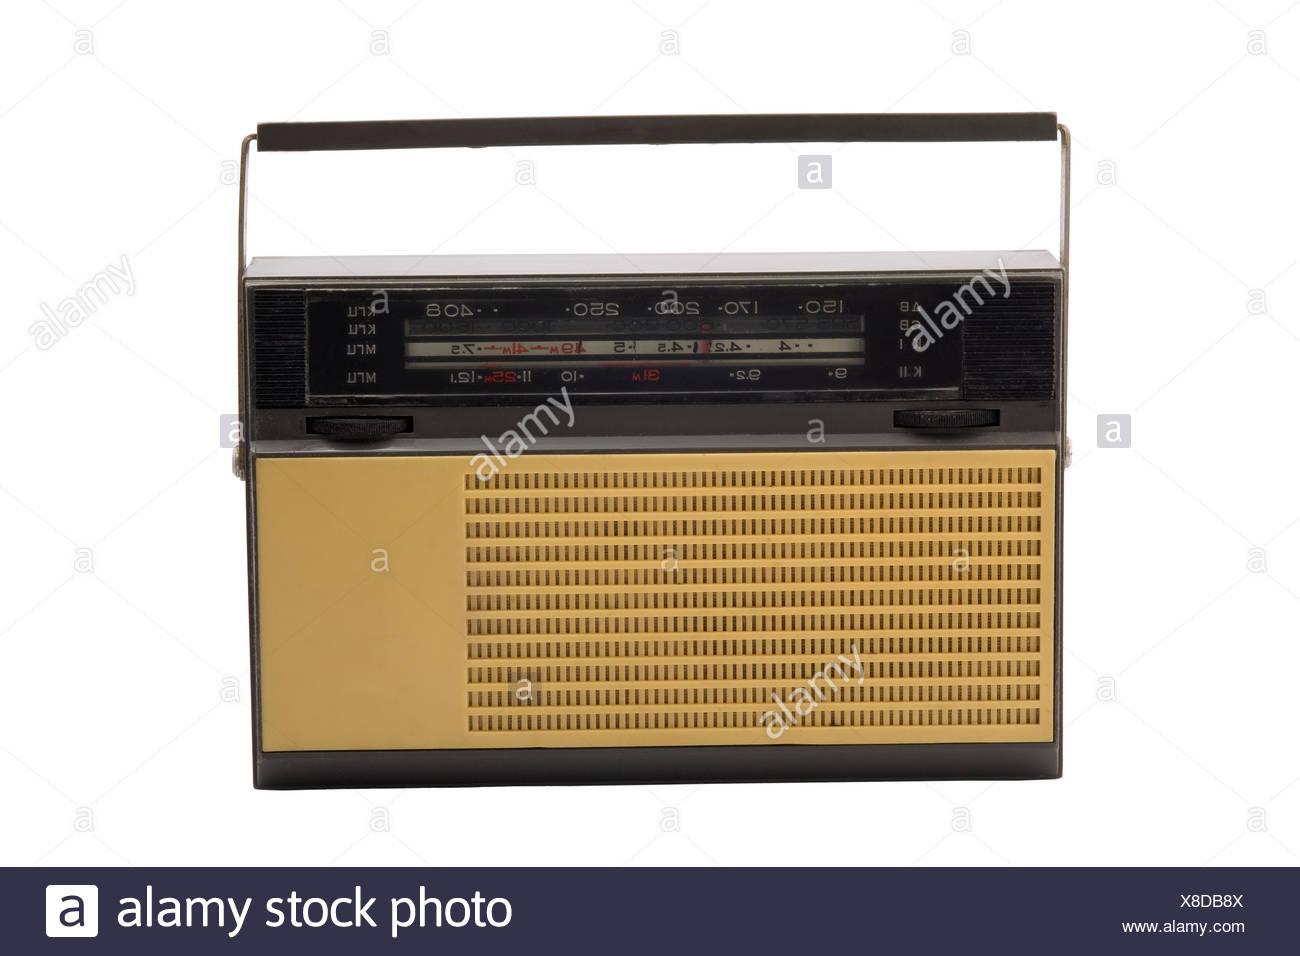 Old-fashioned transistor radio receiver - Stock Image